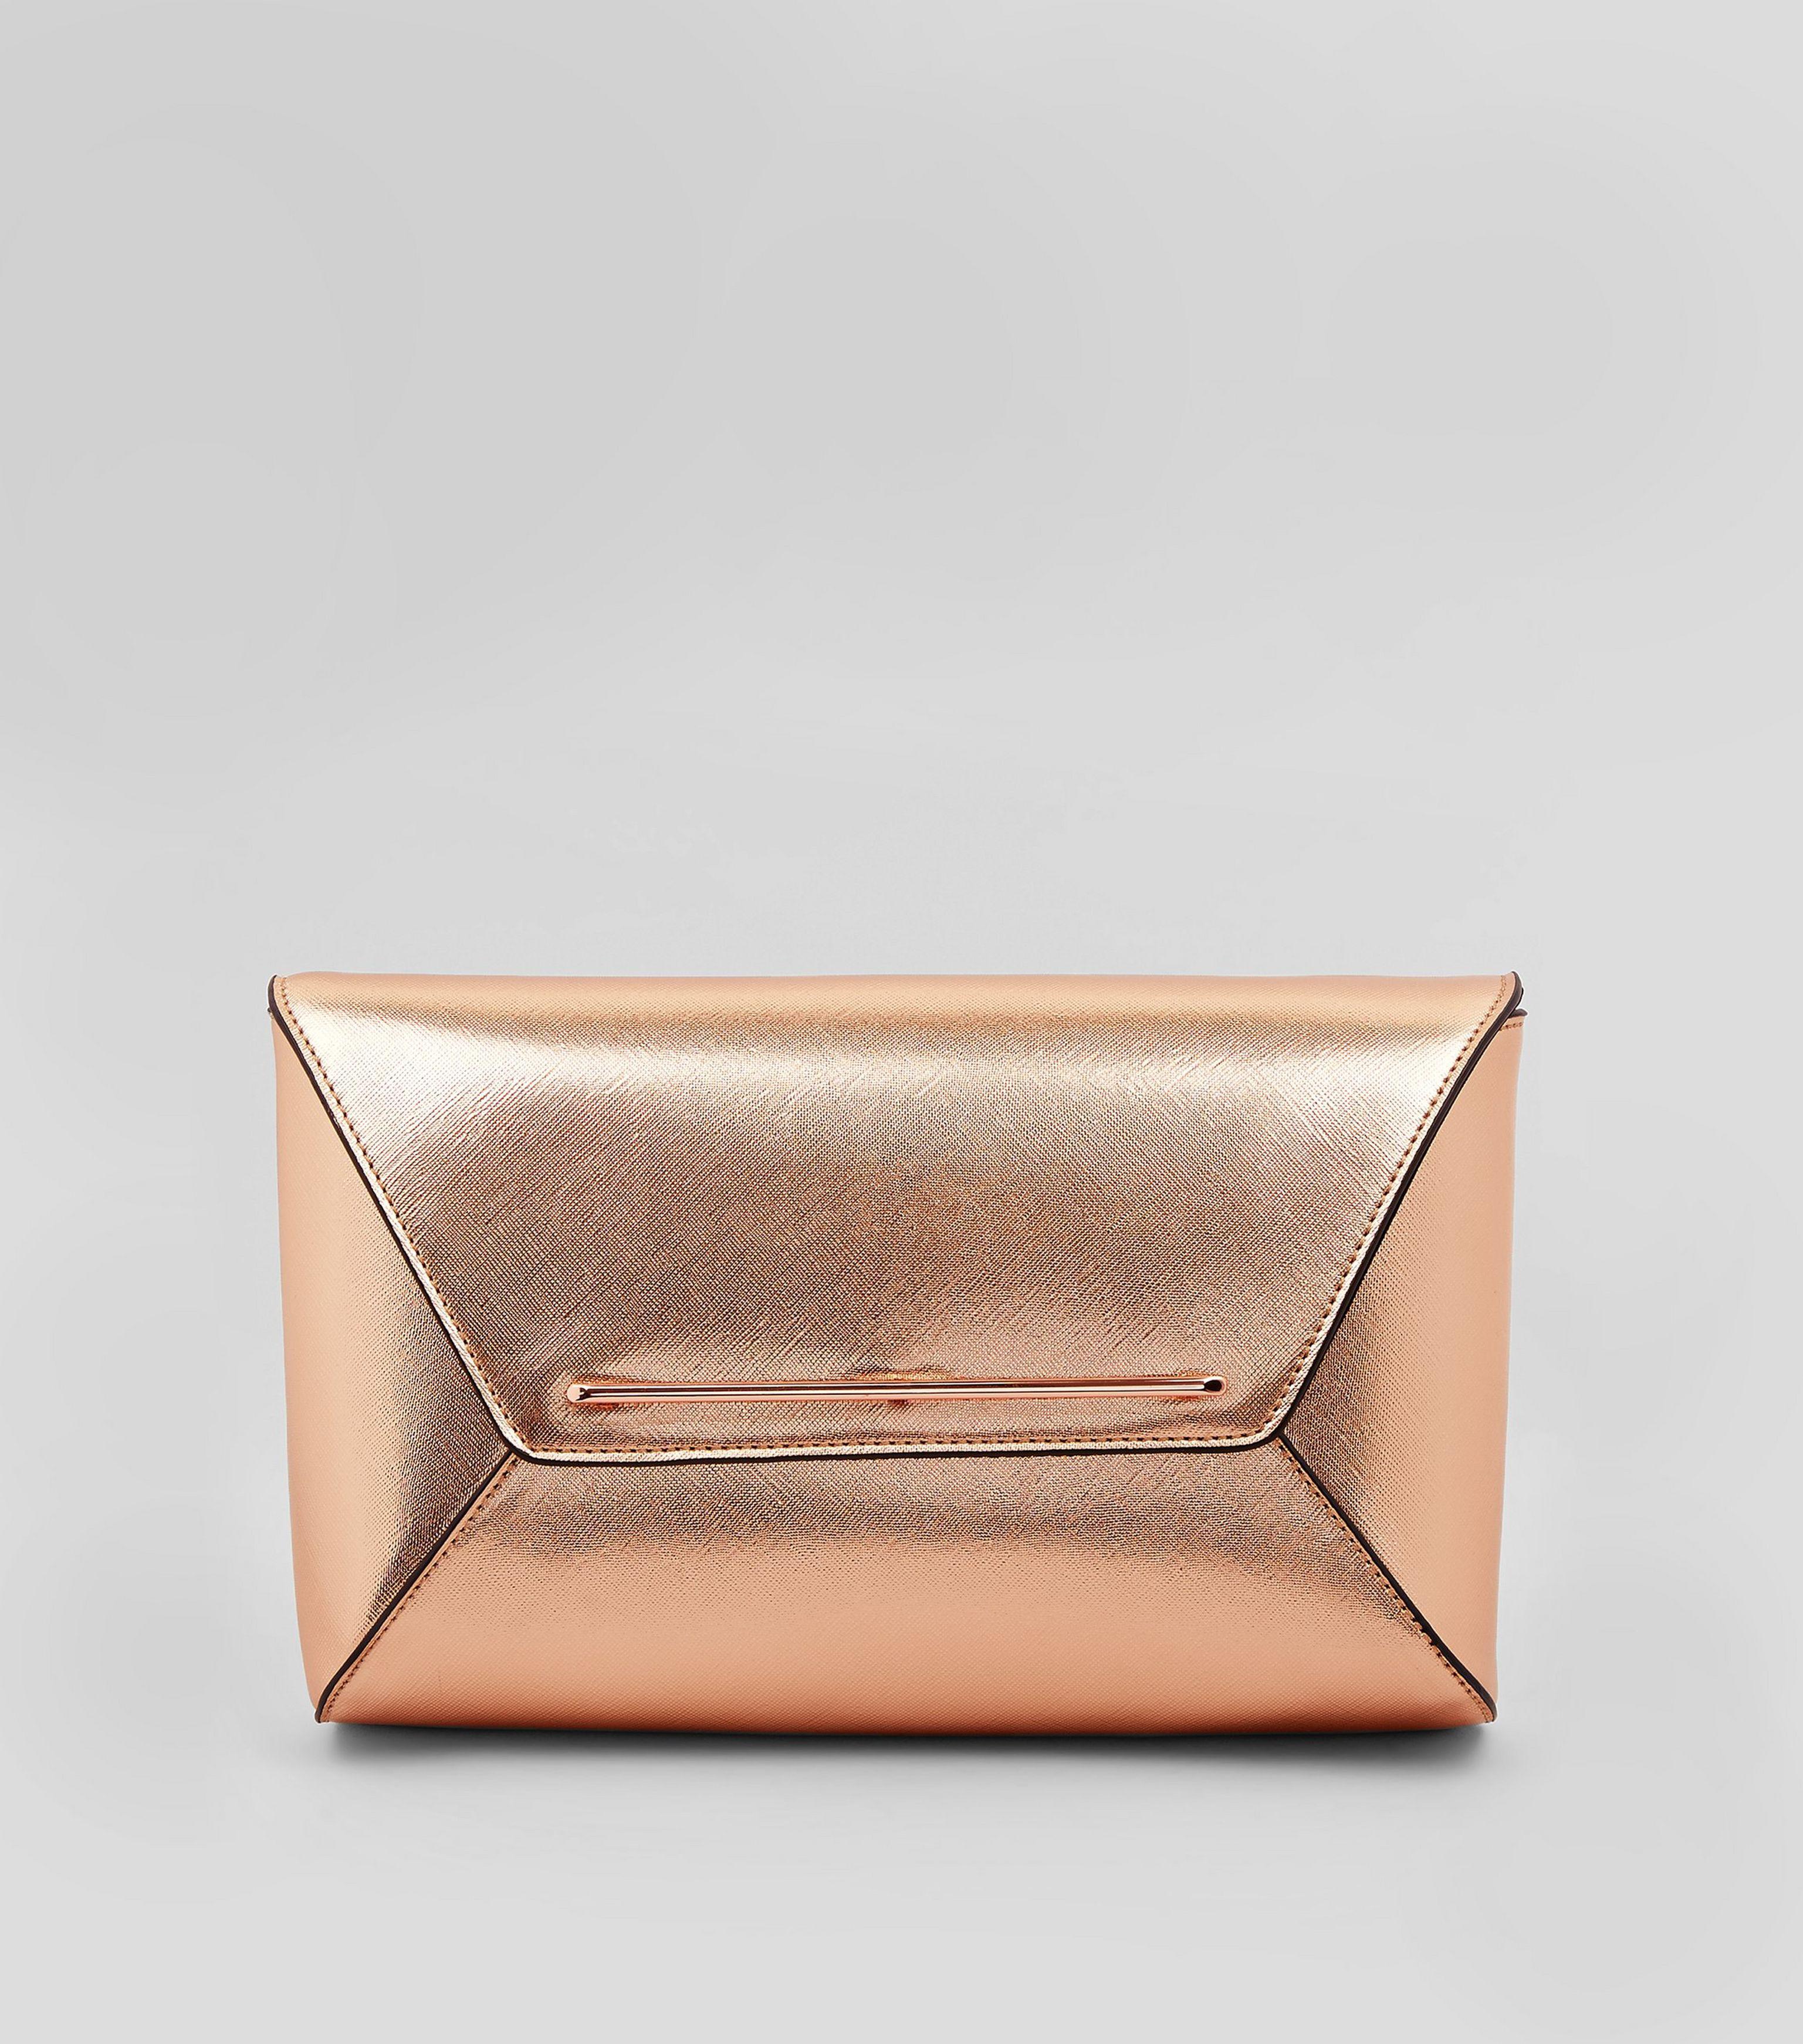 5f59d171776cb New look rose gold metallic envelope clutch bag in metallic lyst jpg  3073x3484 Gold envelope clutch